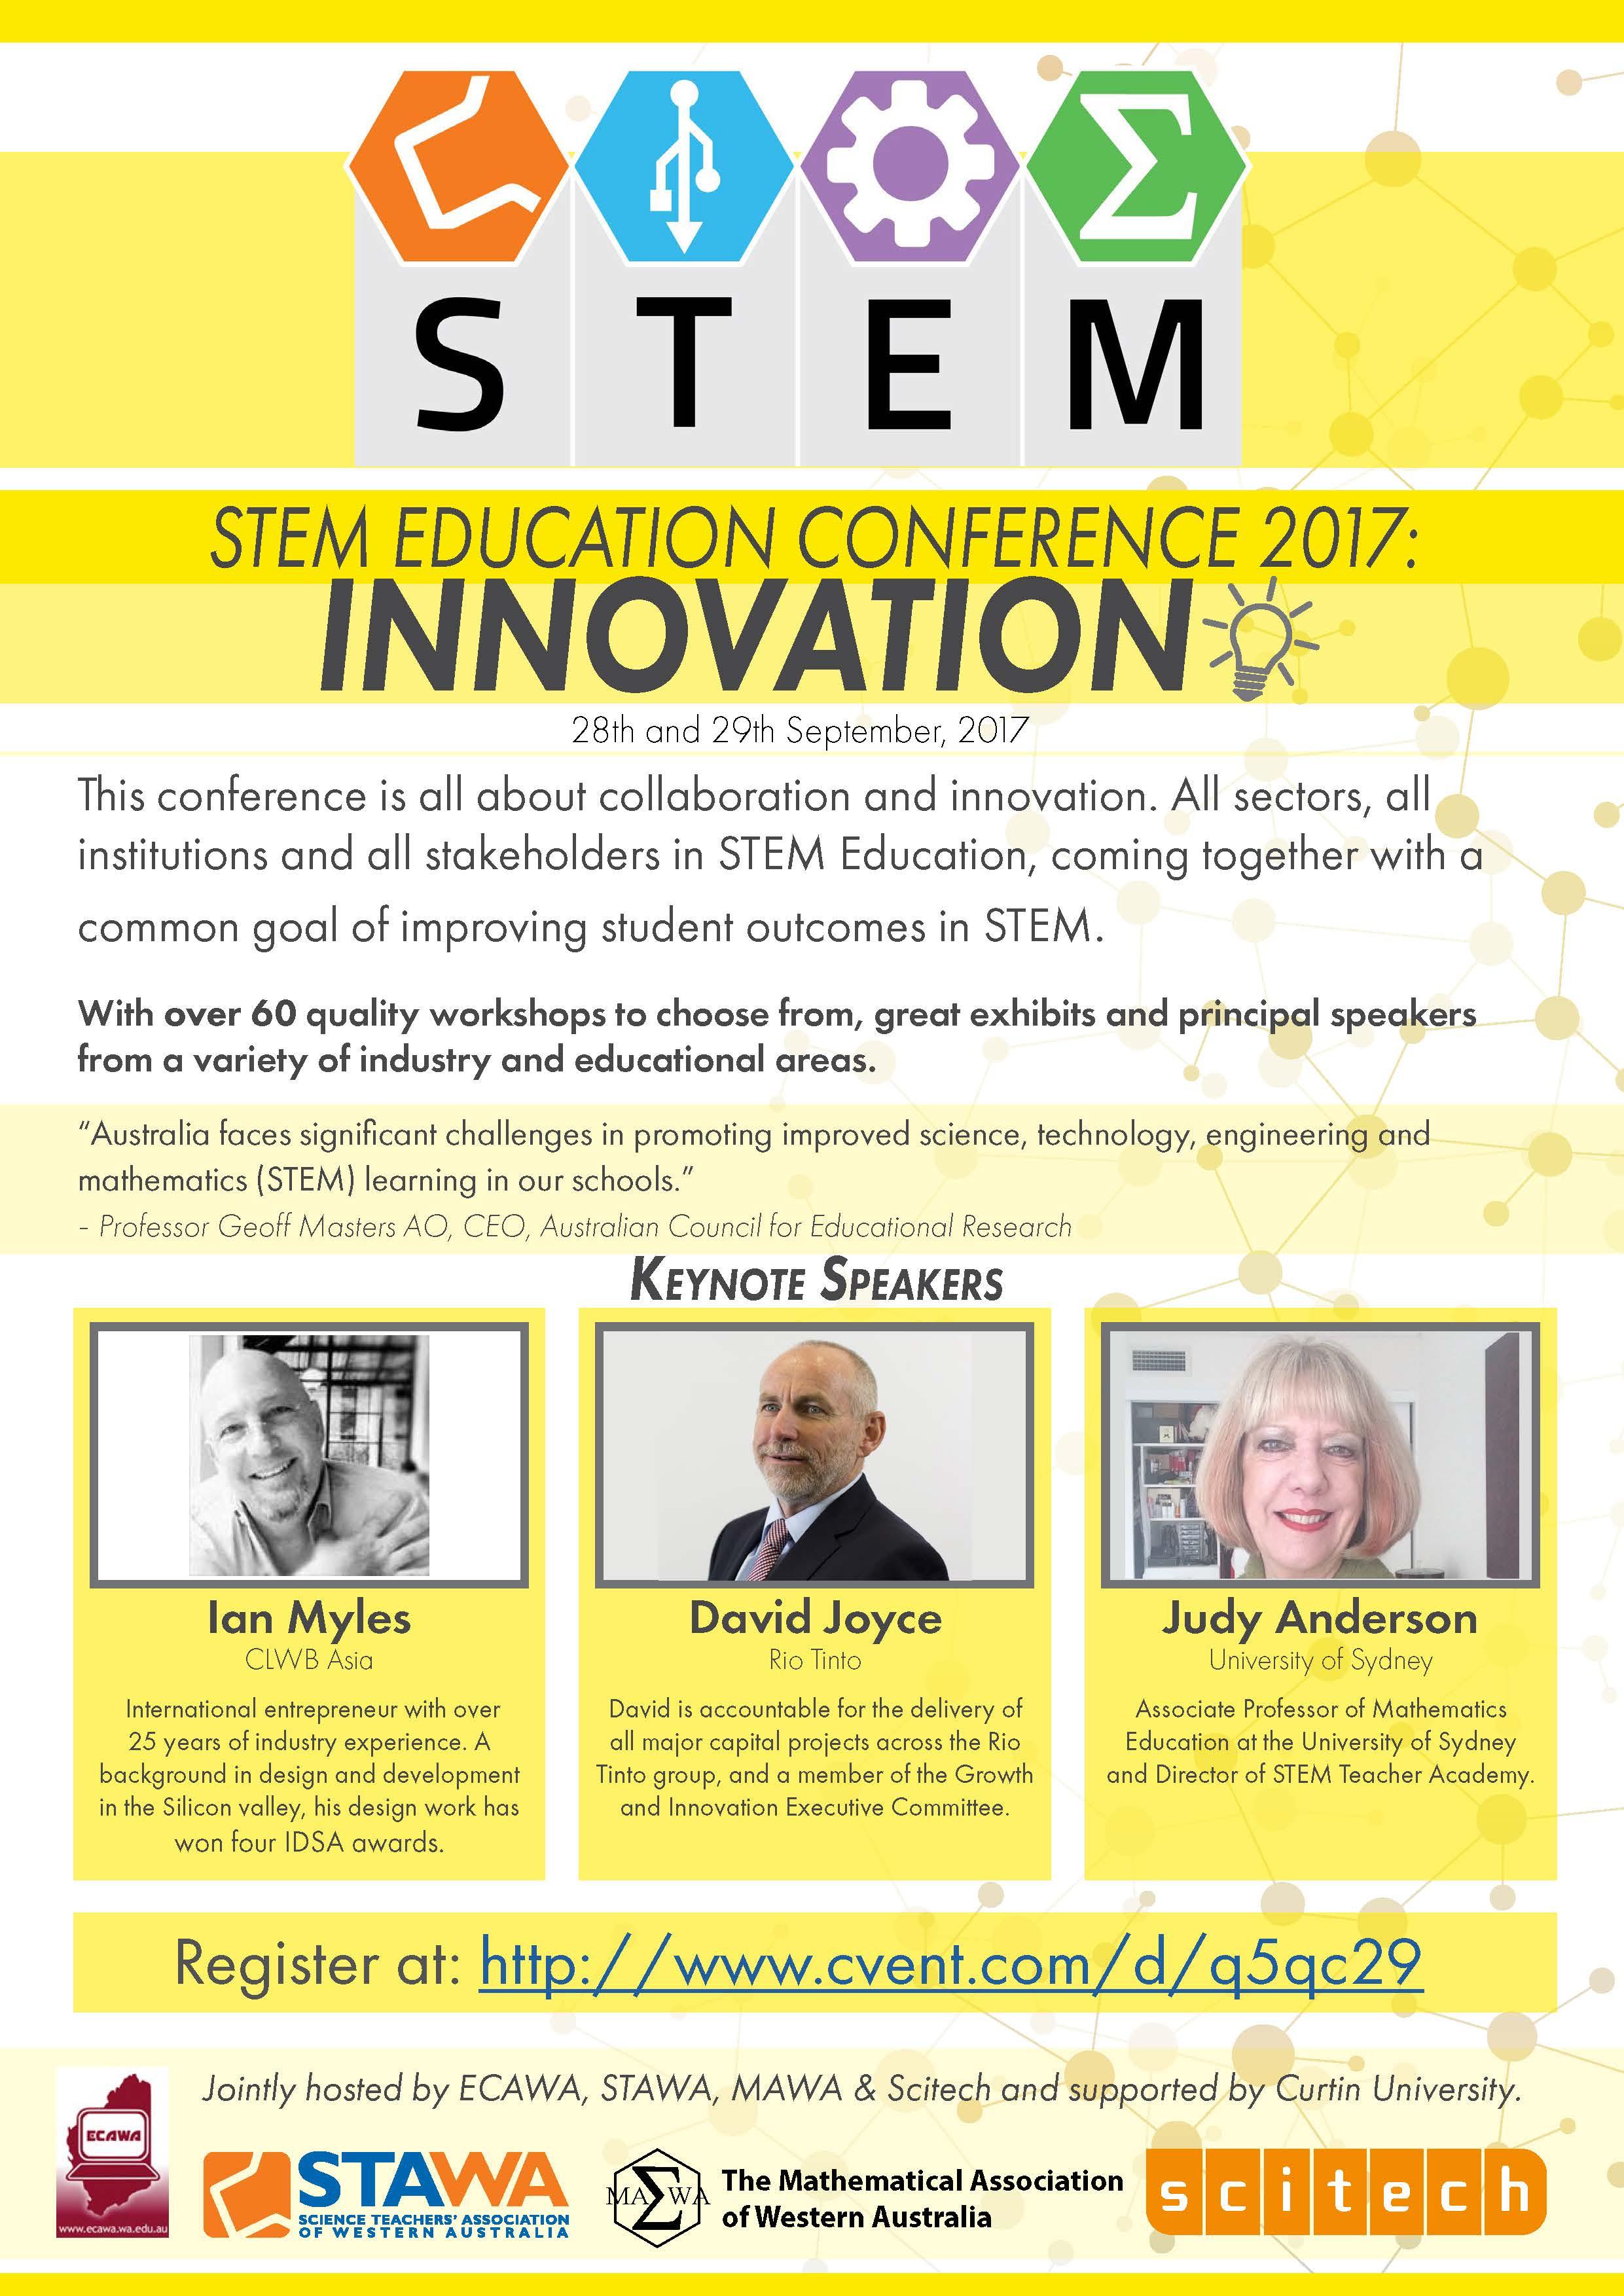 STEM Education Conference 2017